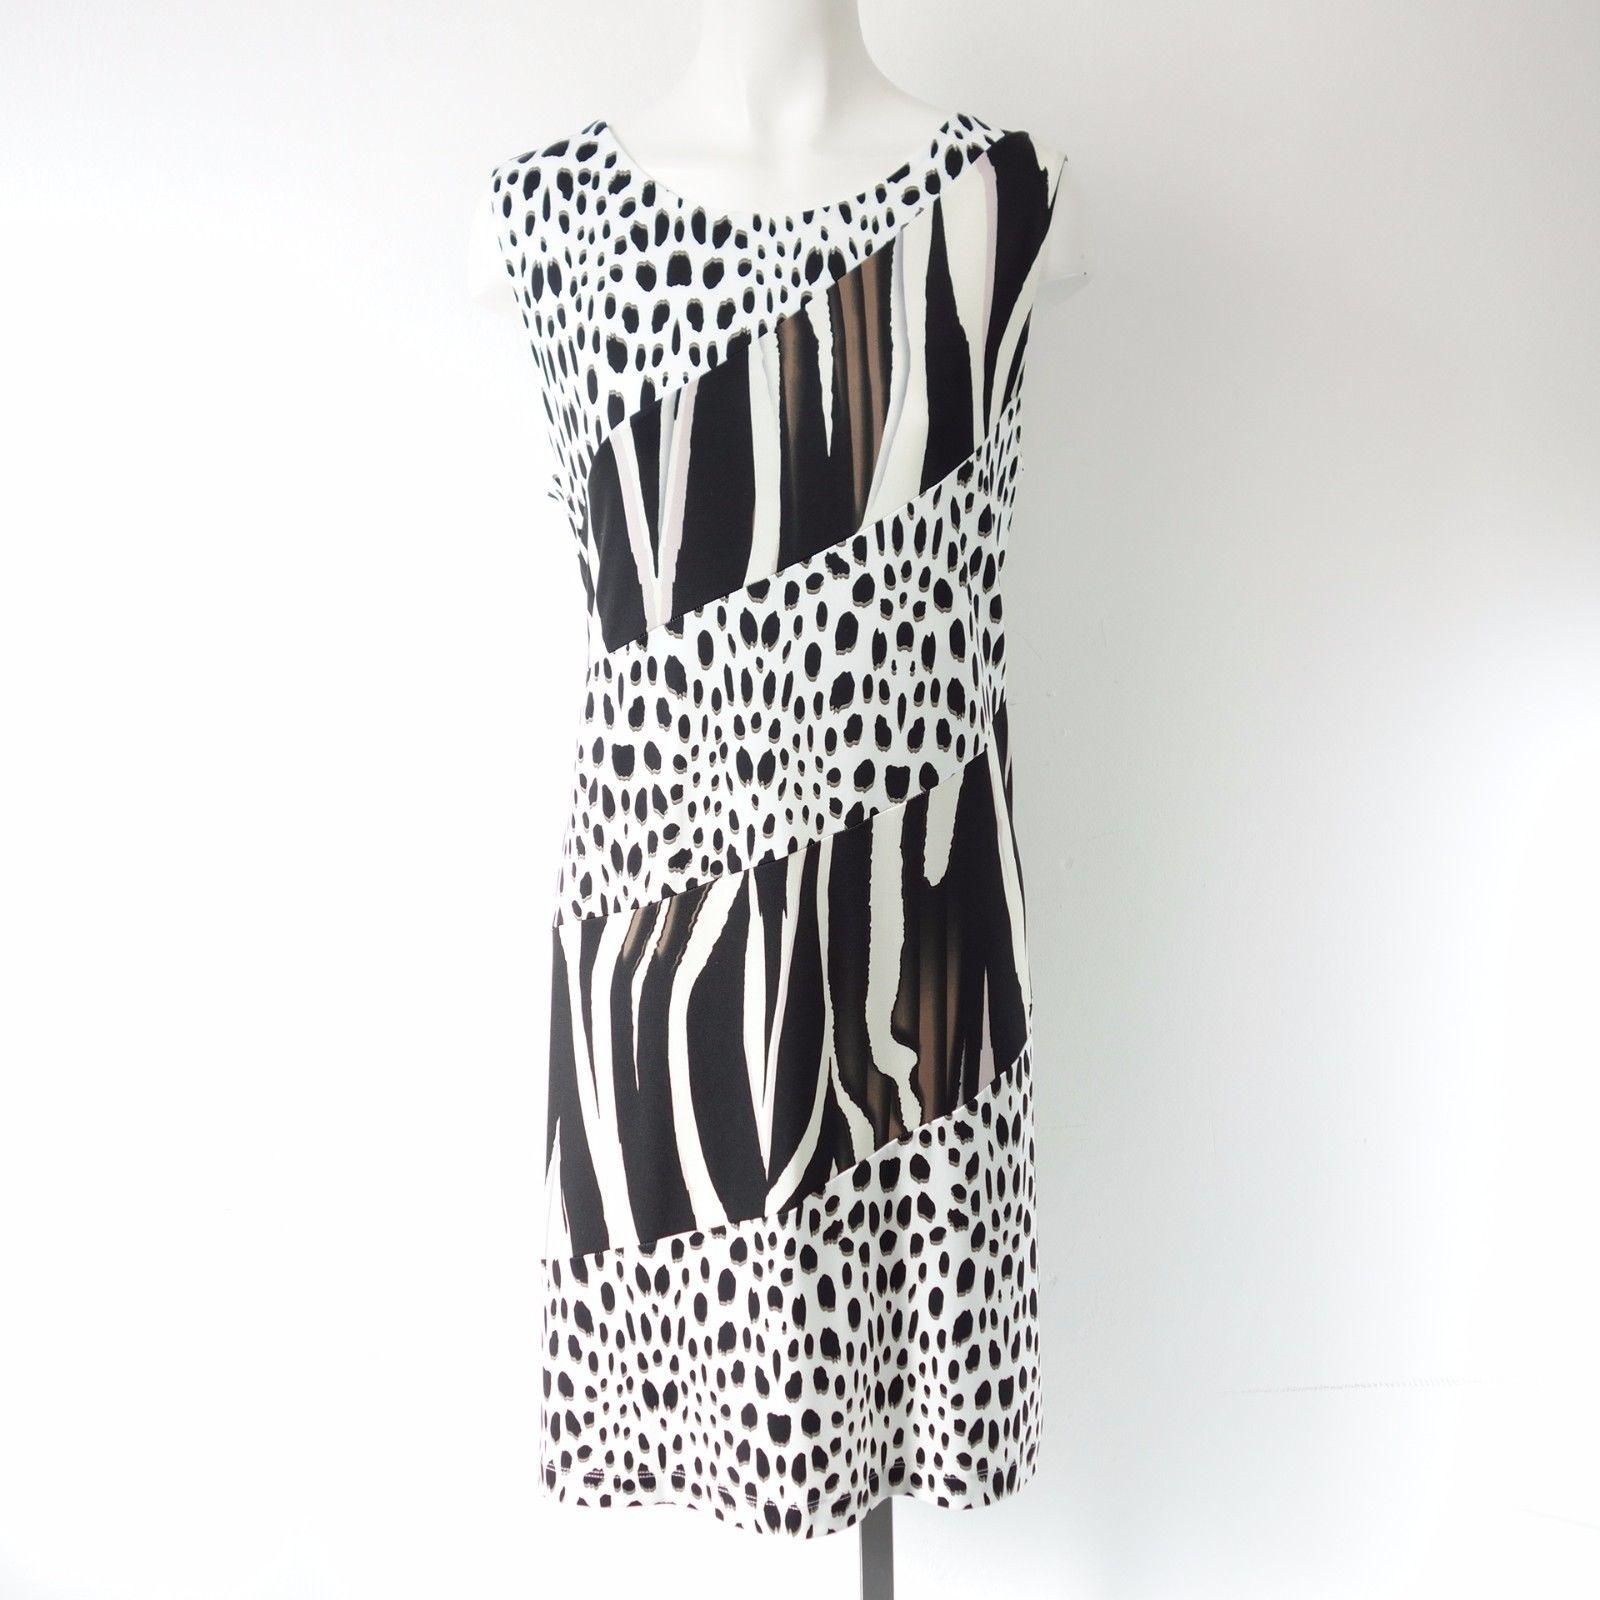 17 Luxurius Kleid 40 Ärmel20 Luxus Kleid 40 Ärmel